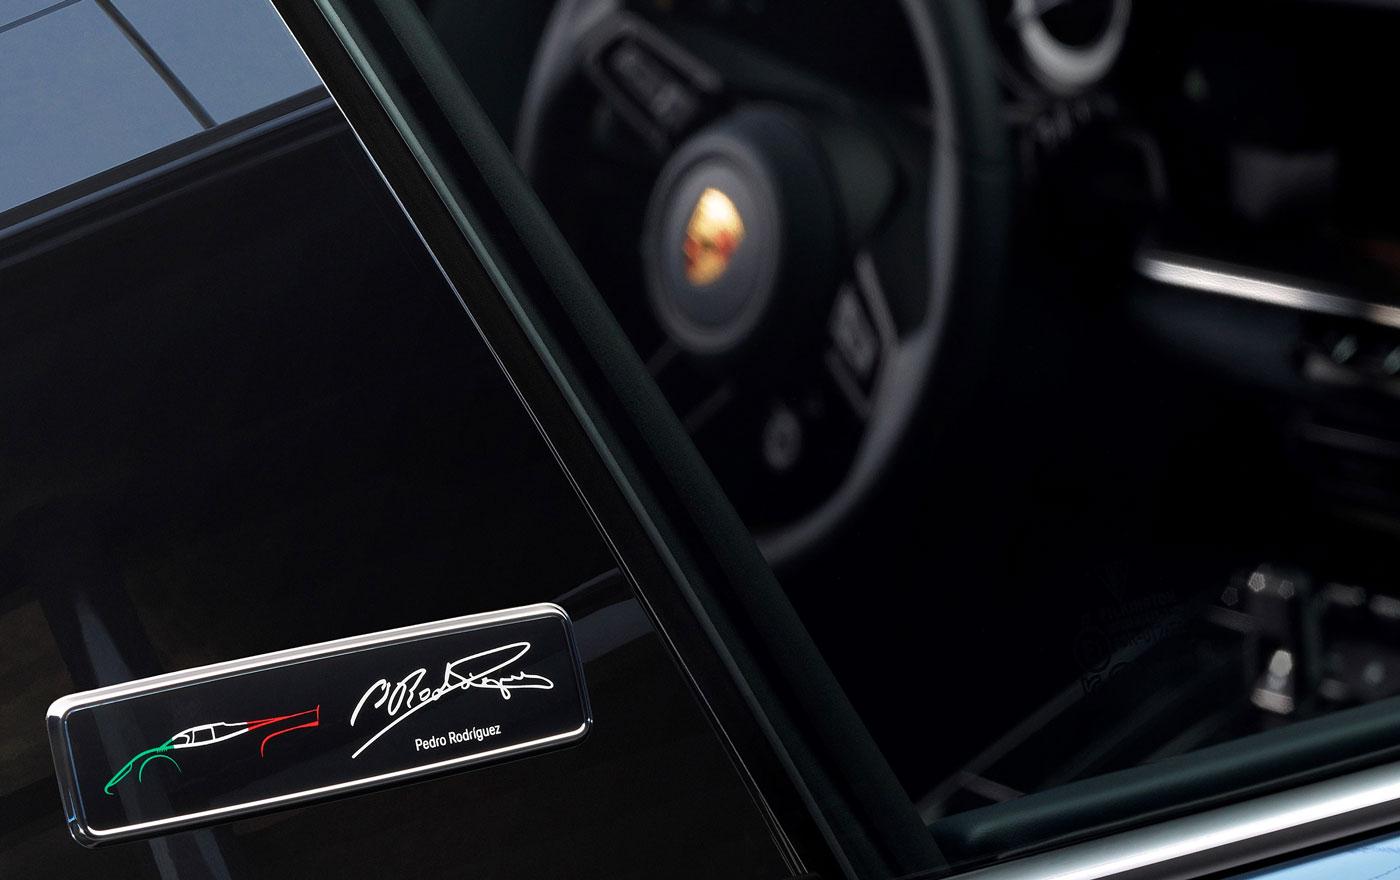 Porsche-992-Turbo-S-Pedro-Rodriguez-8